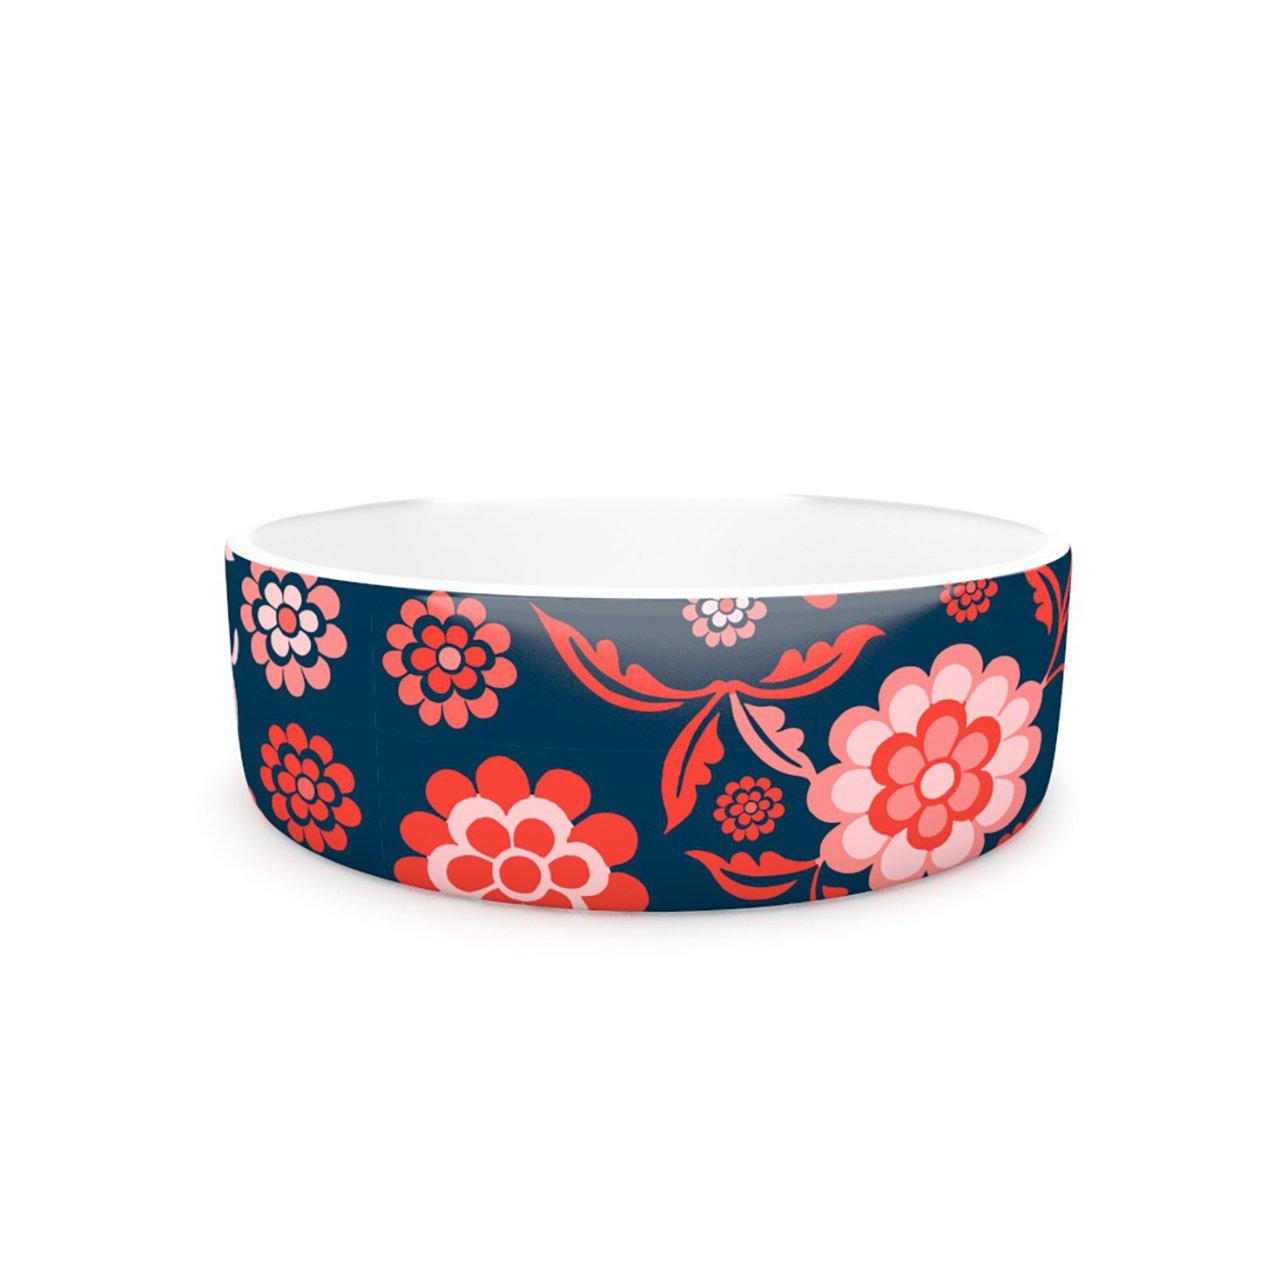 Kess InHouse Nicole Ketchum Cherry Floral Midnight  Pet Bowl, 7-Inch